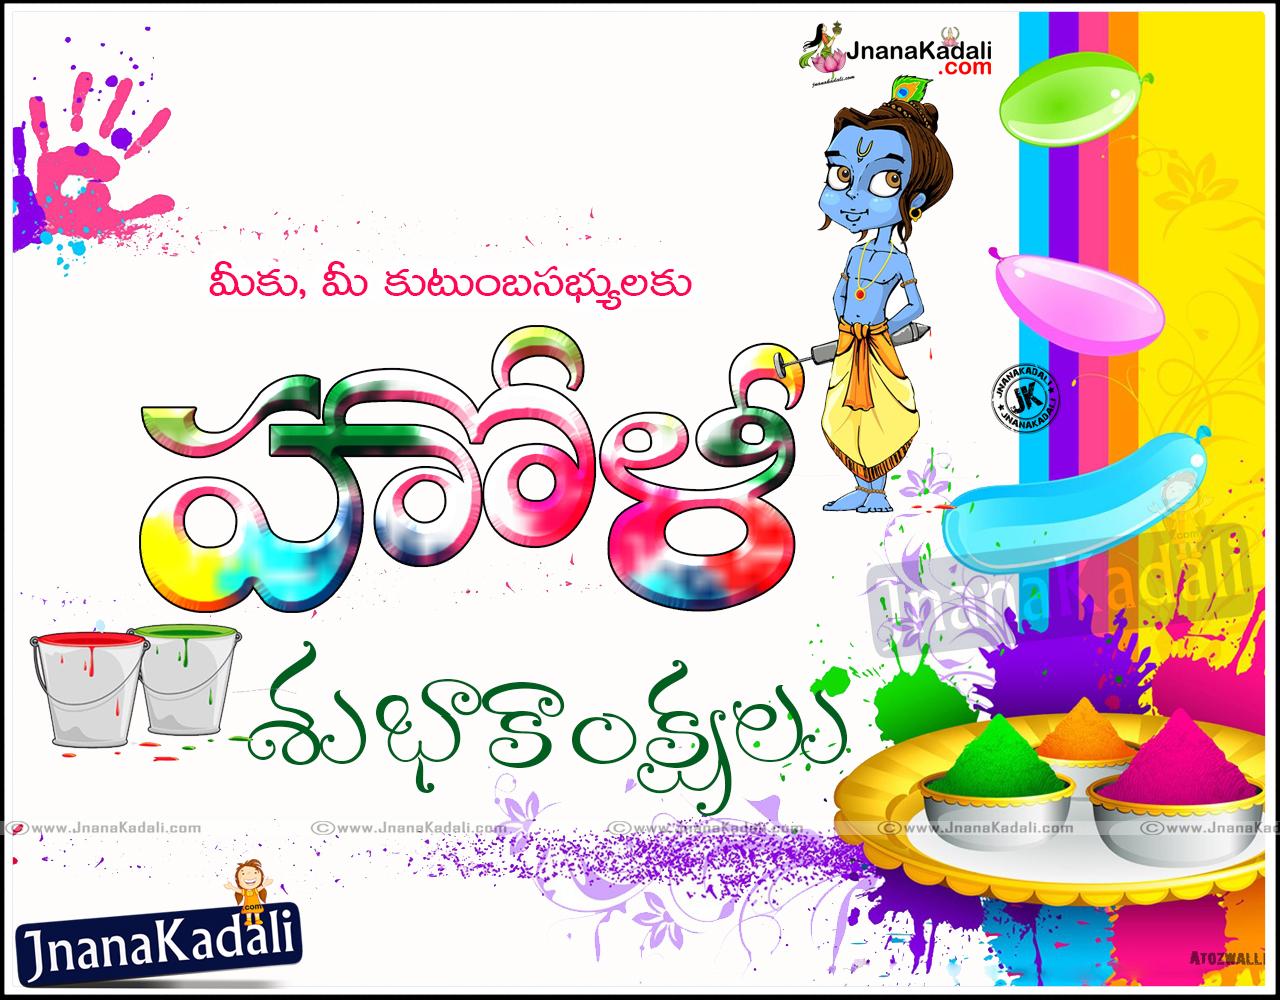 Holi greetings wishes quotes hd holi wallpapers jnana kadali happy holi telugu quotations wallpapers indian festival holi greetings in telugu language best telugu m4hsunfo